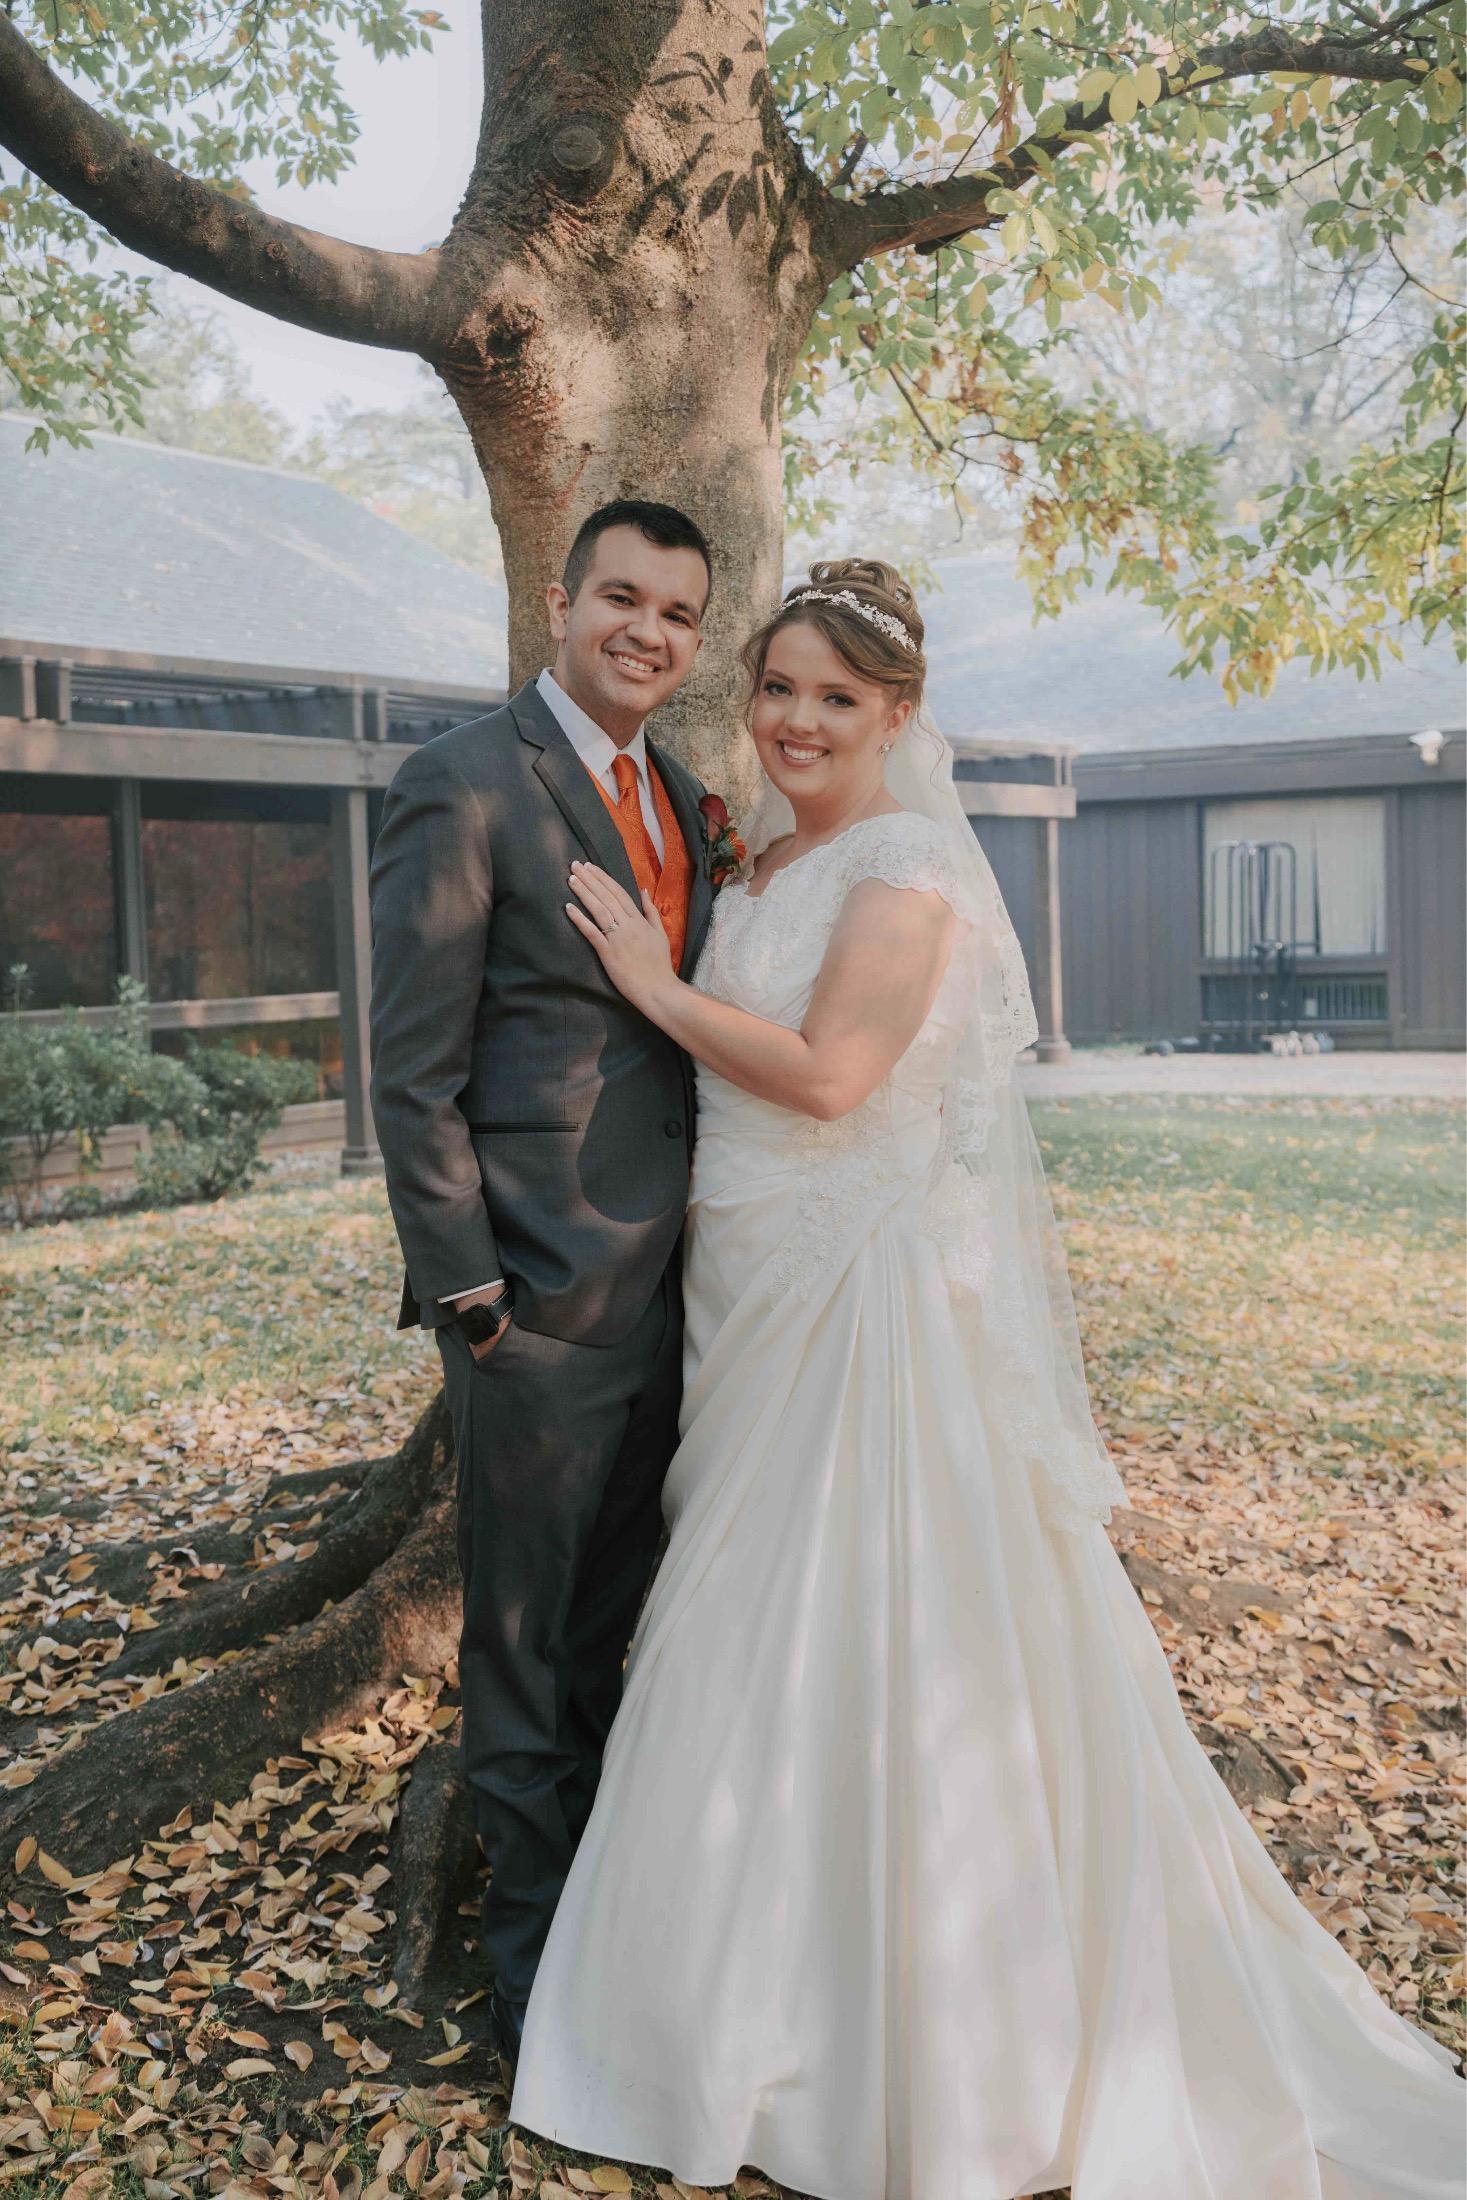 Creekside rose garden wedding photography chico_2.jpg